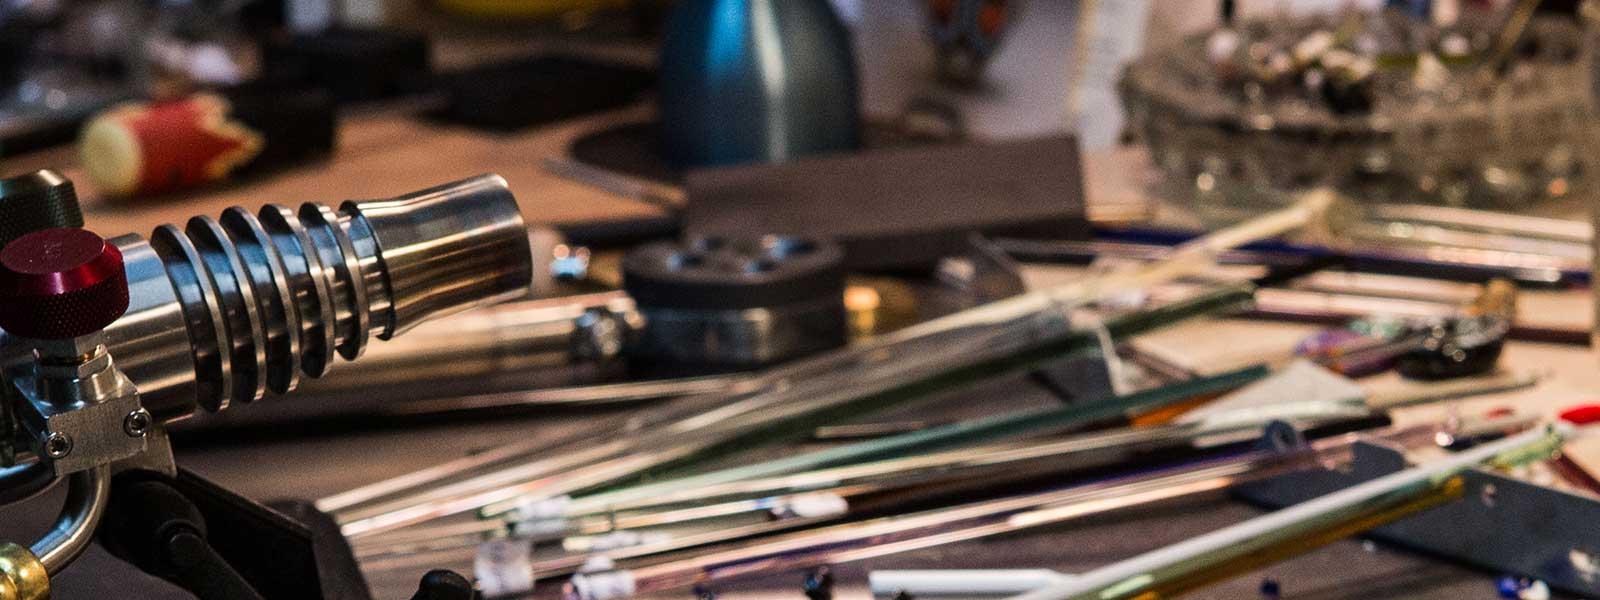 Setting up your lampwork studio